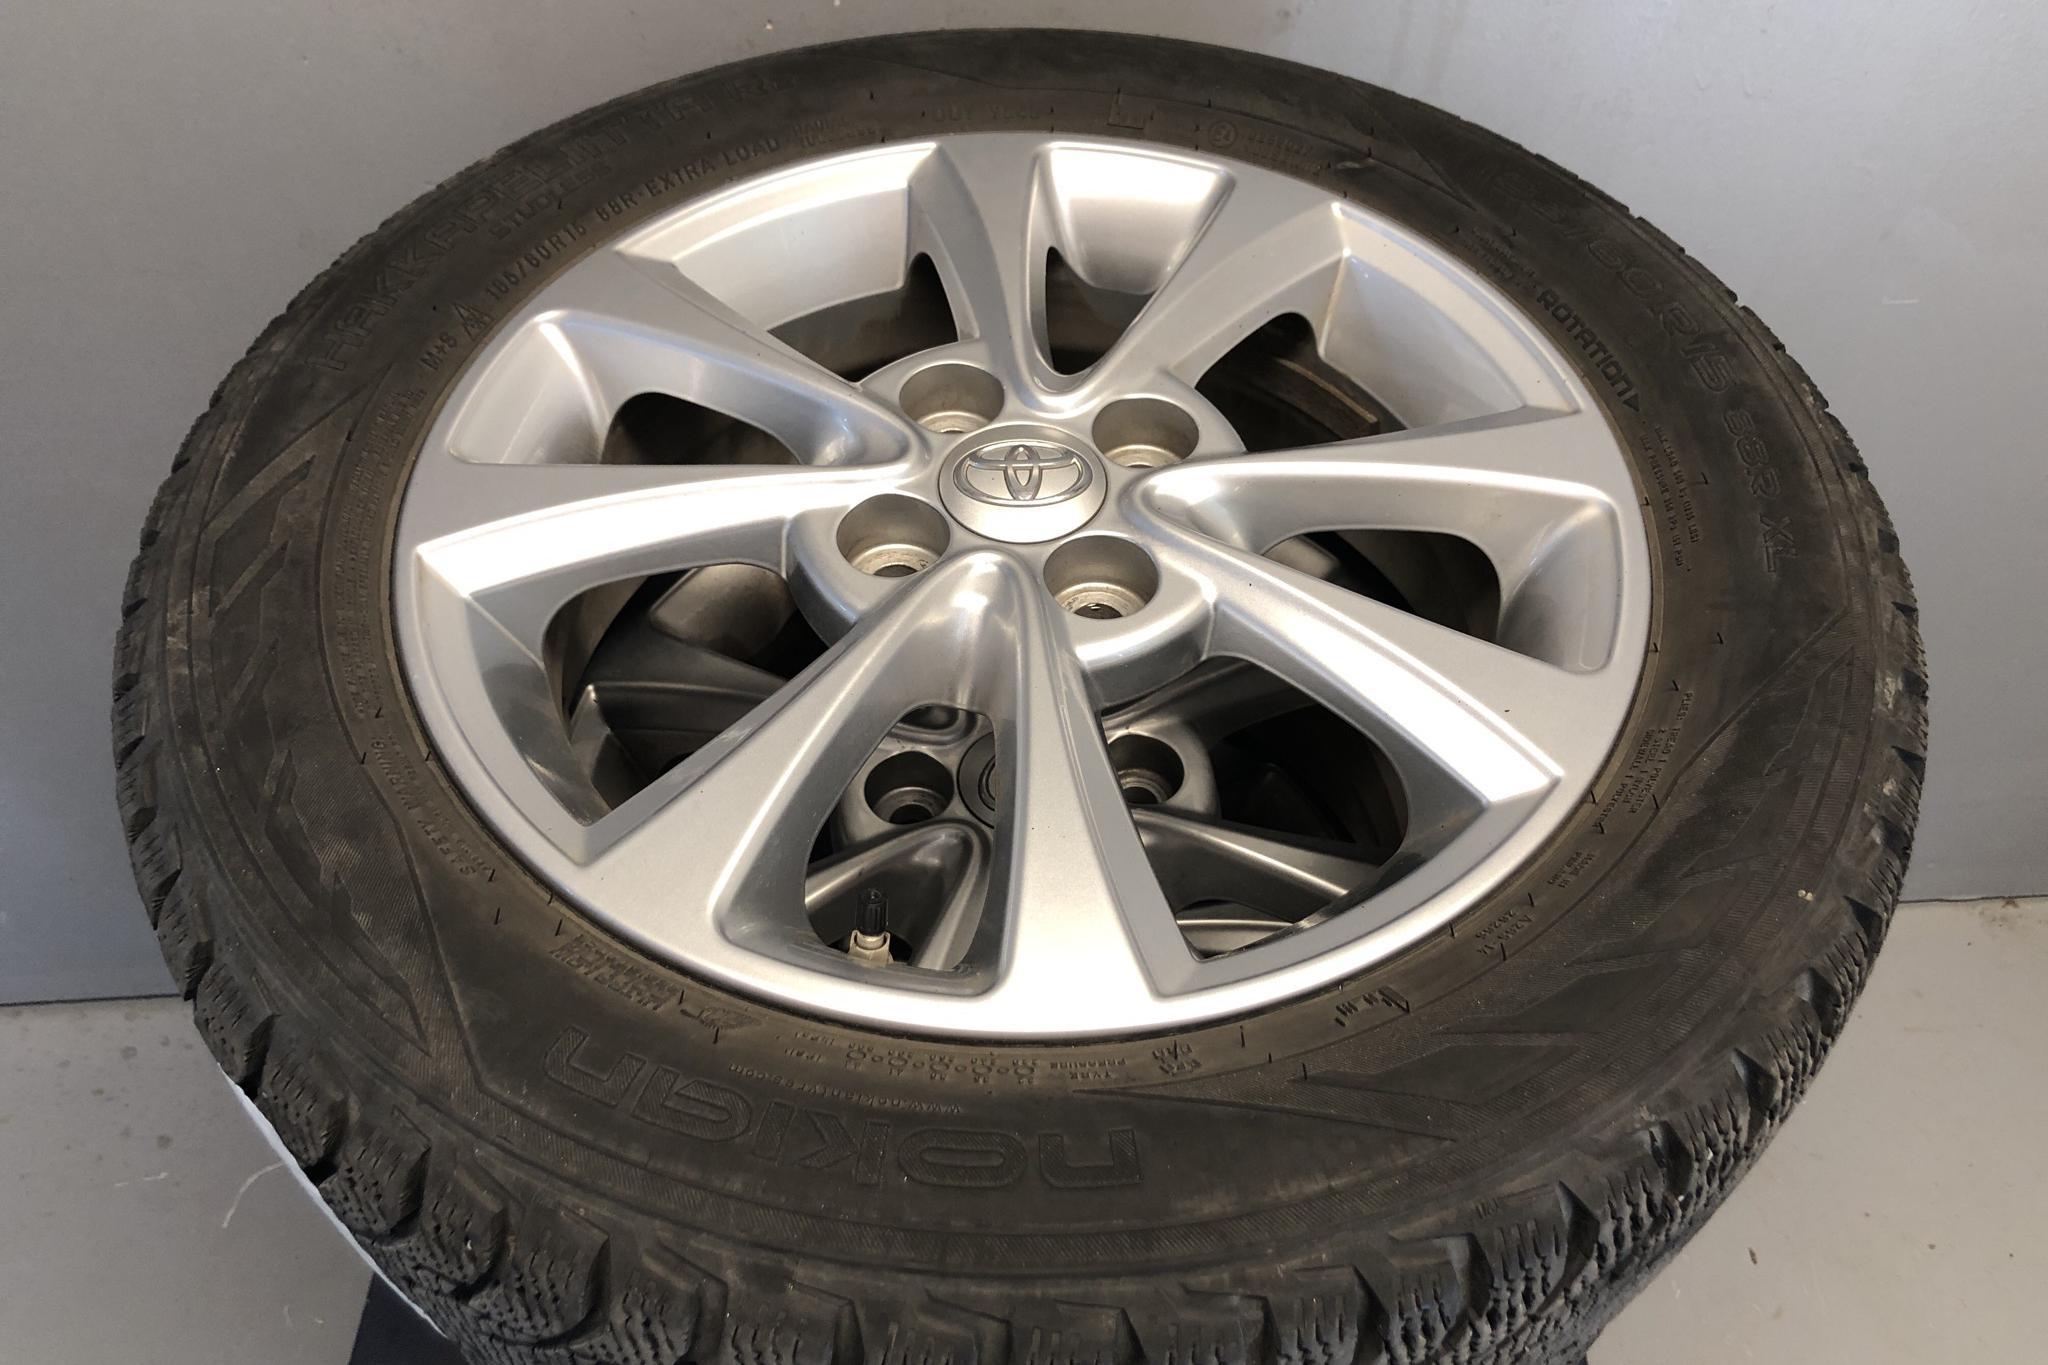 Toyota Yaris 1.5 Hybrid 5dr (101hk) - 4 302 mil - Automat - Dark Grey - 2018